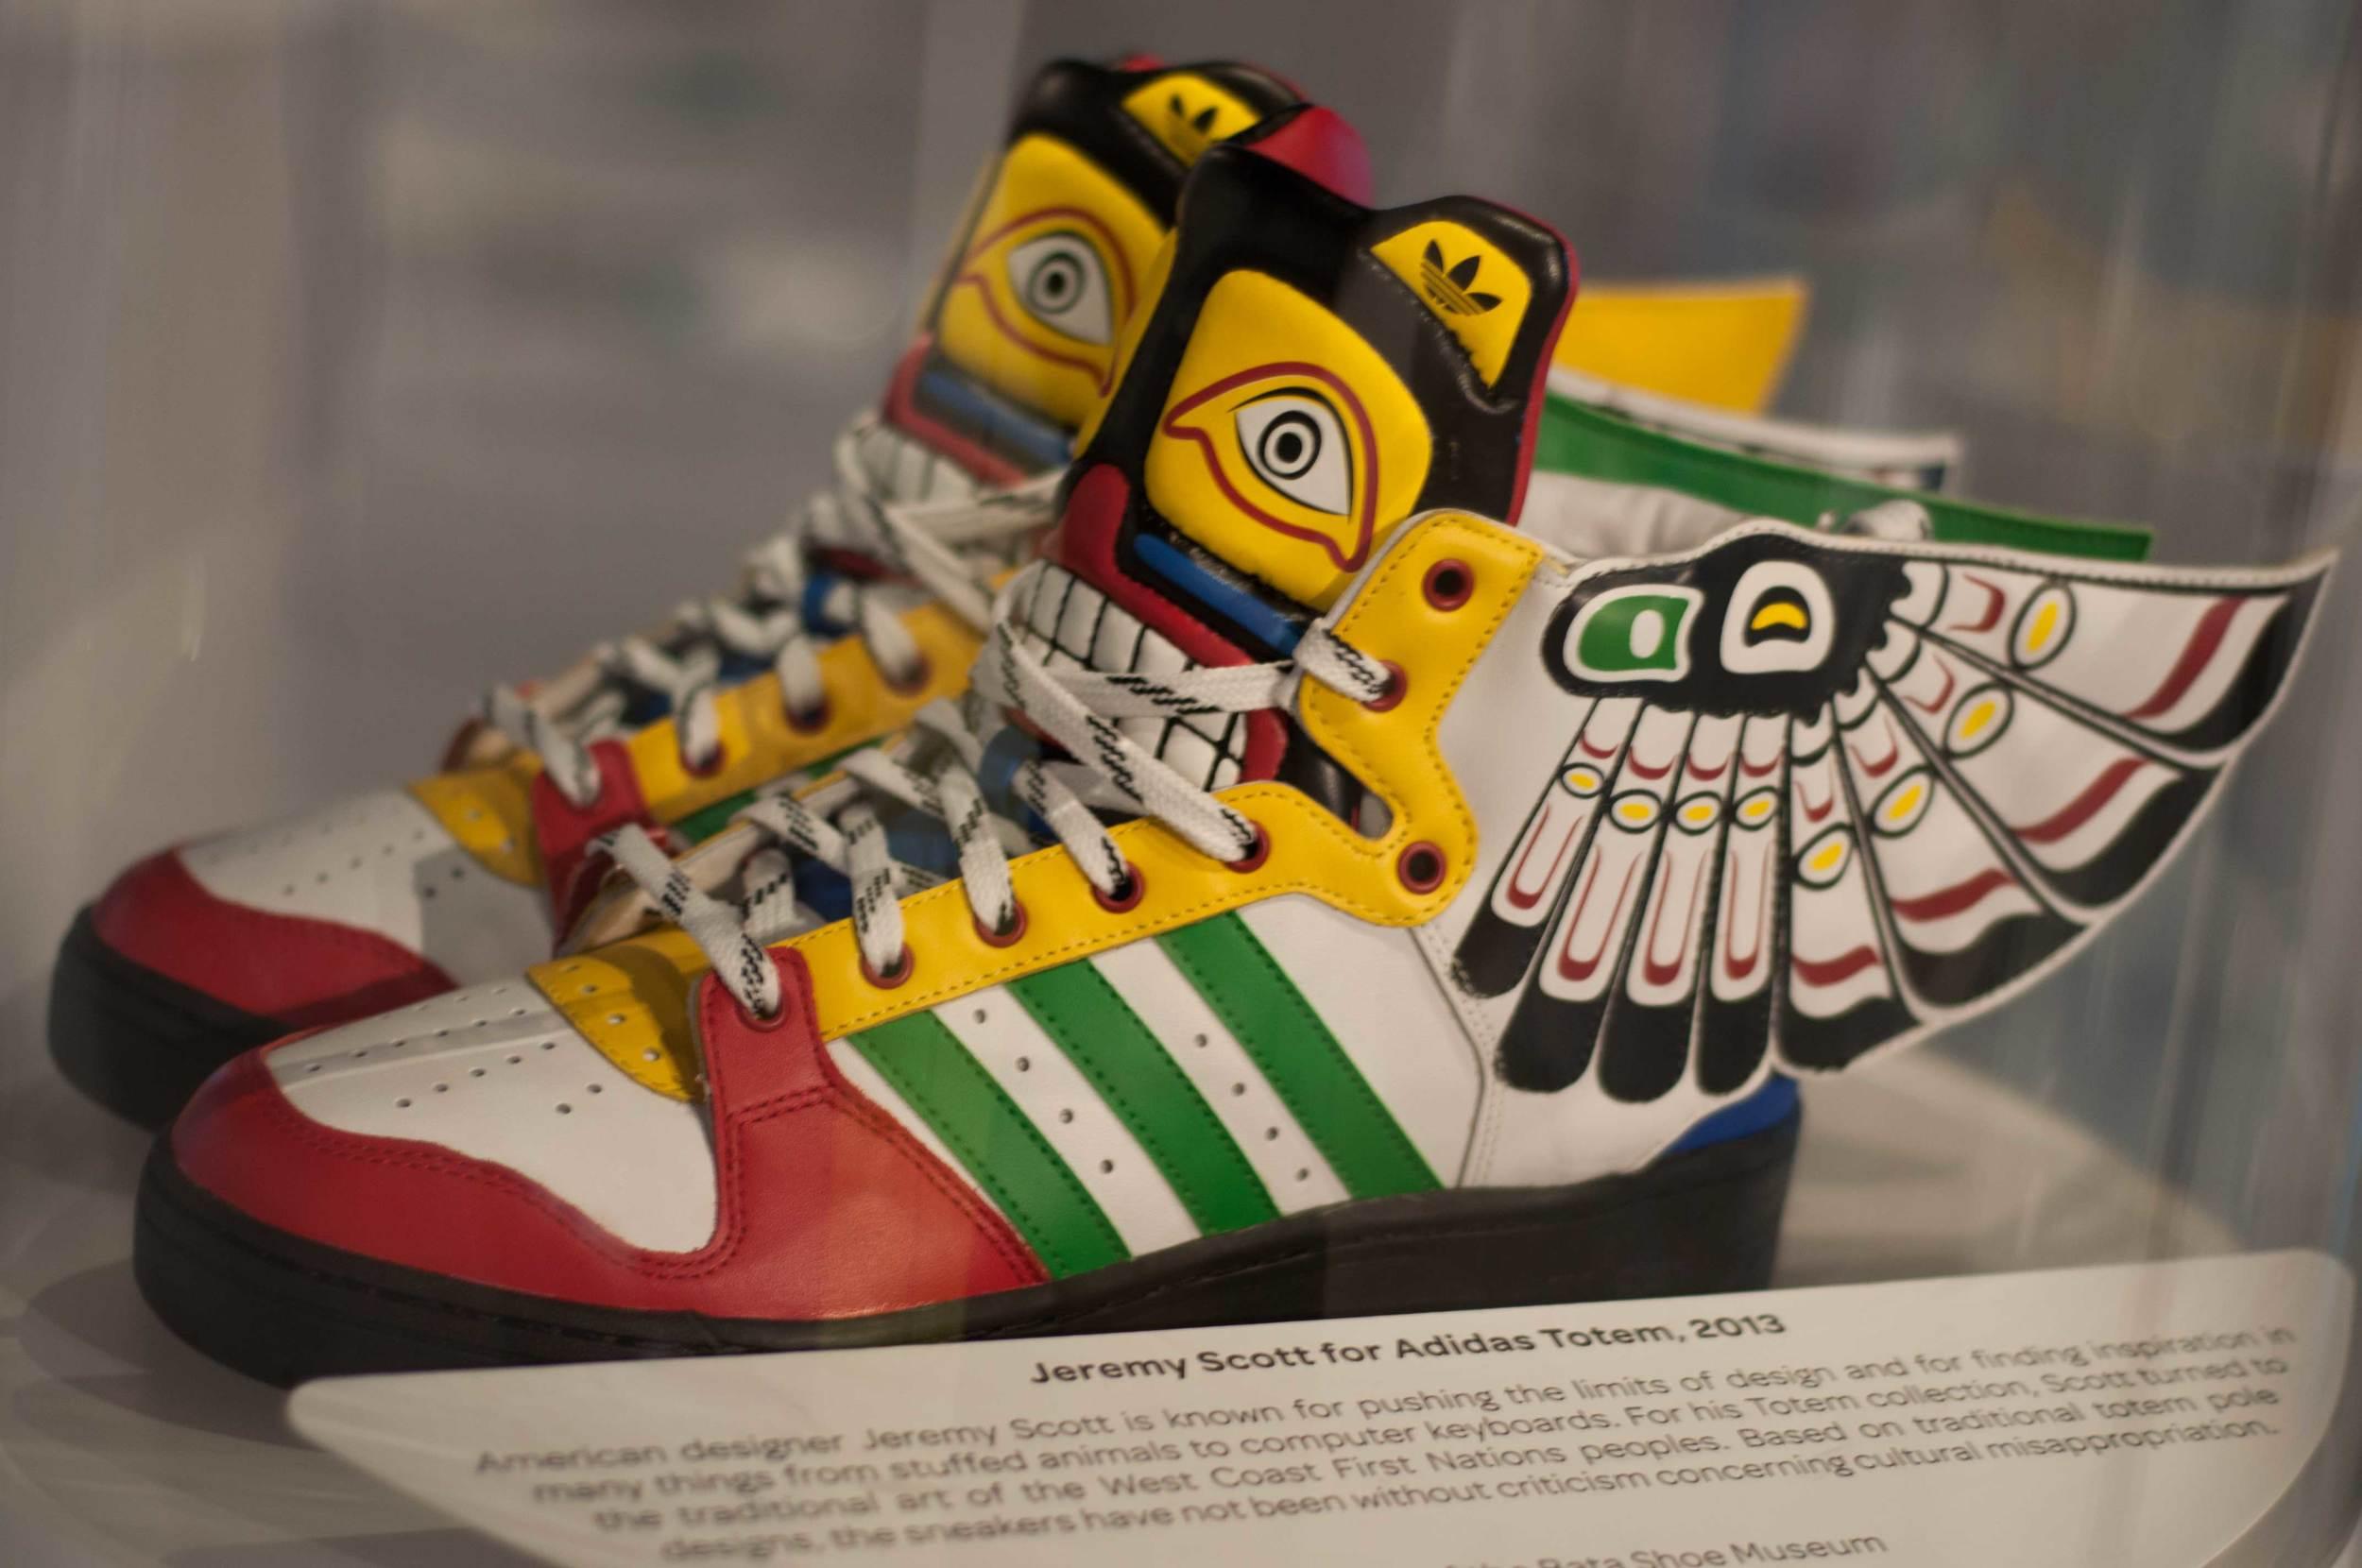 Jeremy Scott for Adidas Totem (2013).jpg